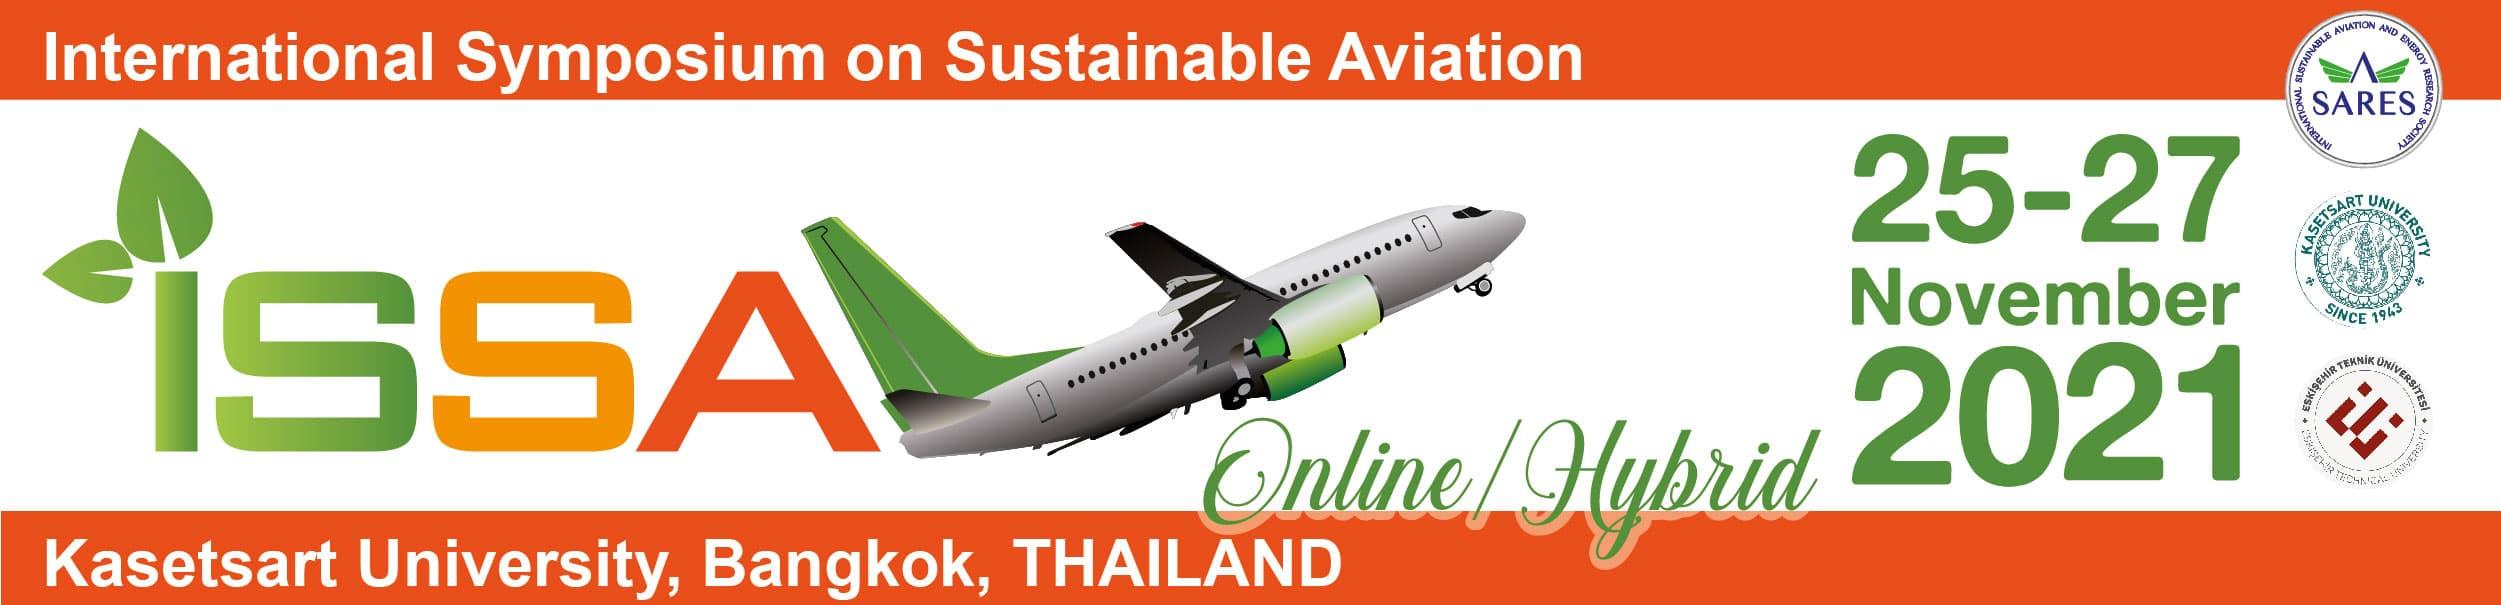 International Symposium on Sustainable Aviation (ISSA)